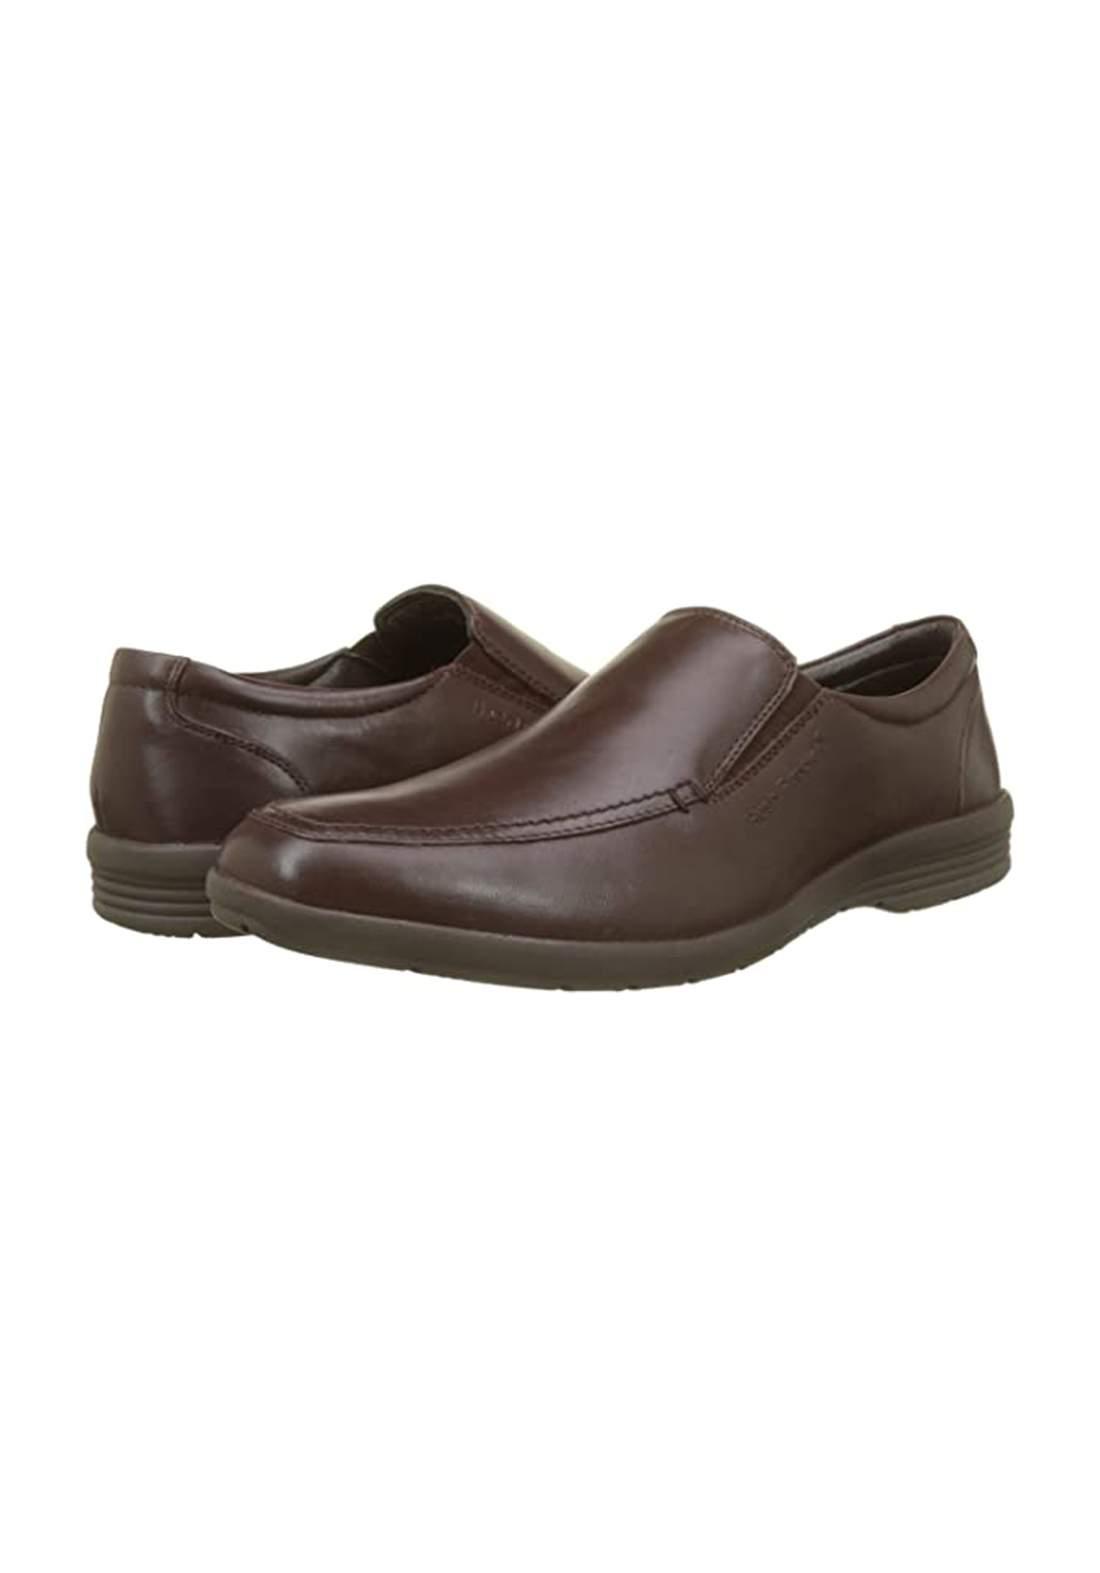 حذاء رجالي رسمي بلون بني غامق جلد طبيعي